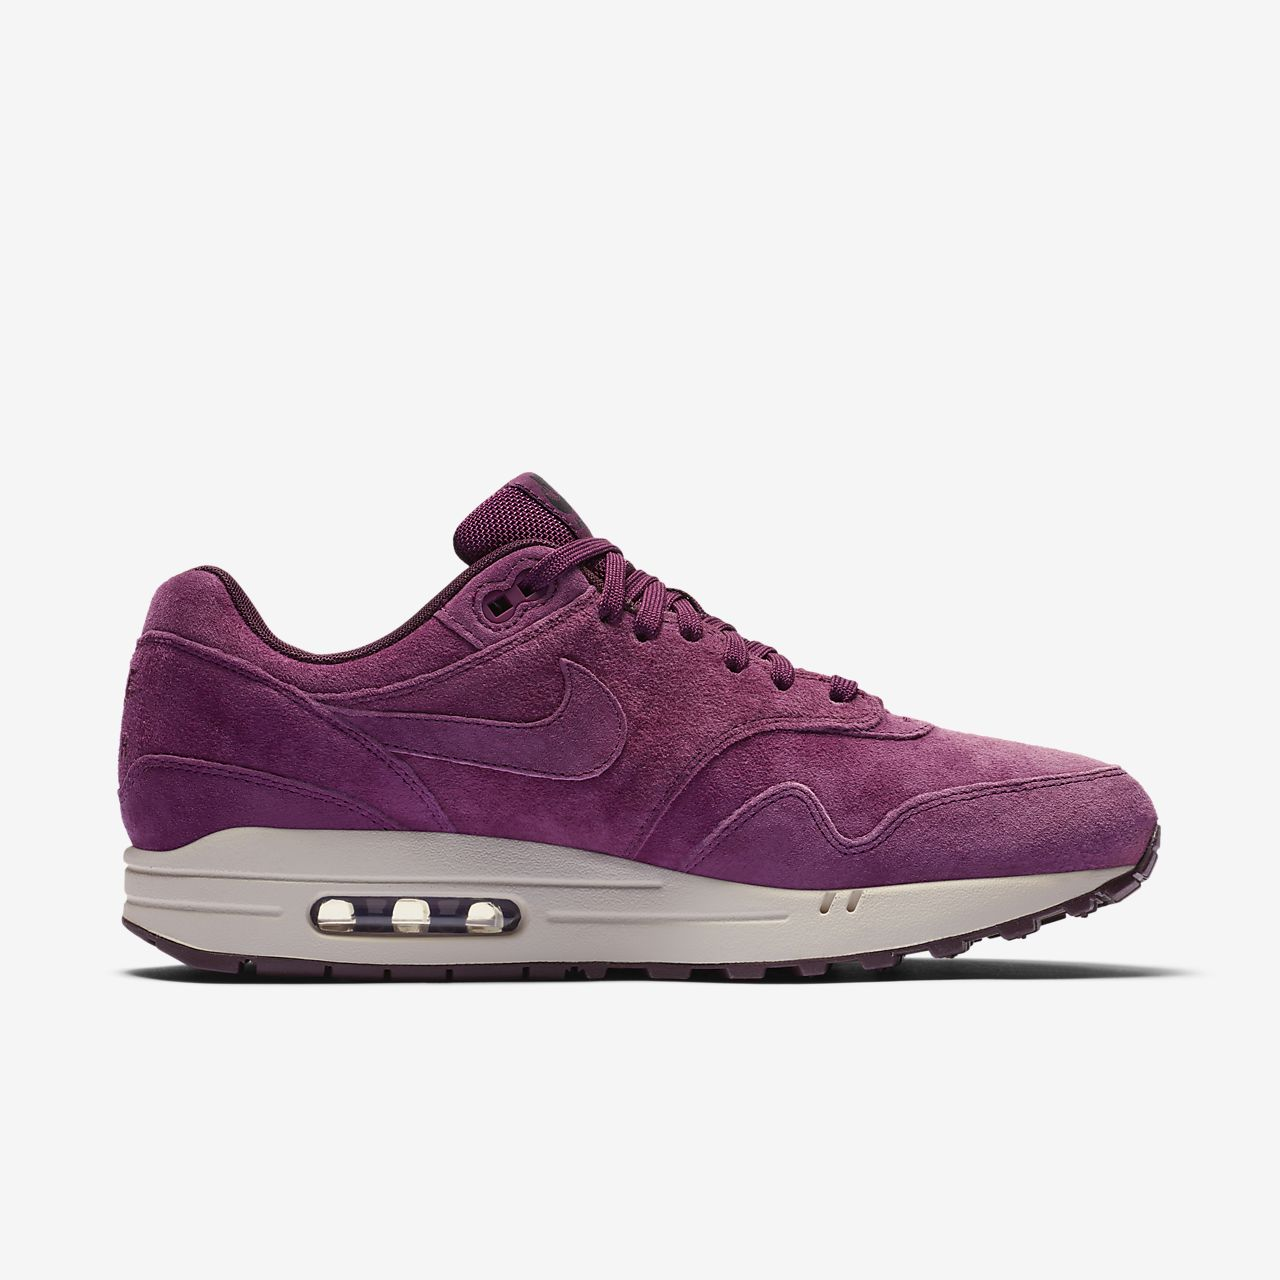 pretty nice a8c1b 89ebb ... Nike Air Max 1 Premium Men s Shoe